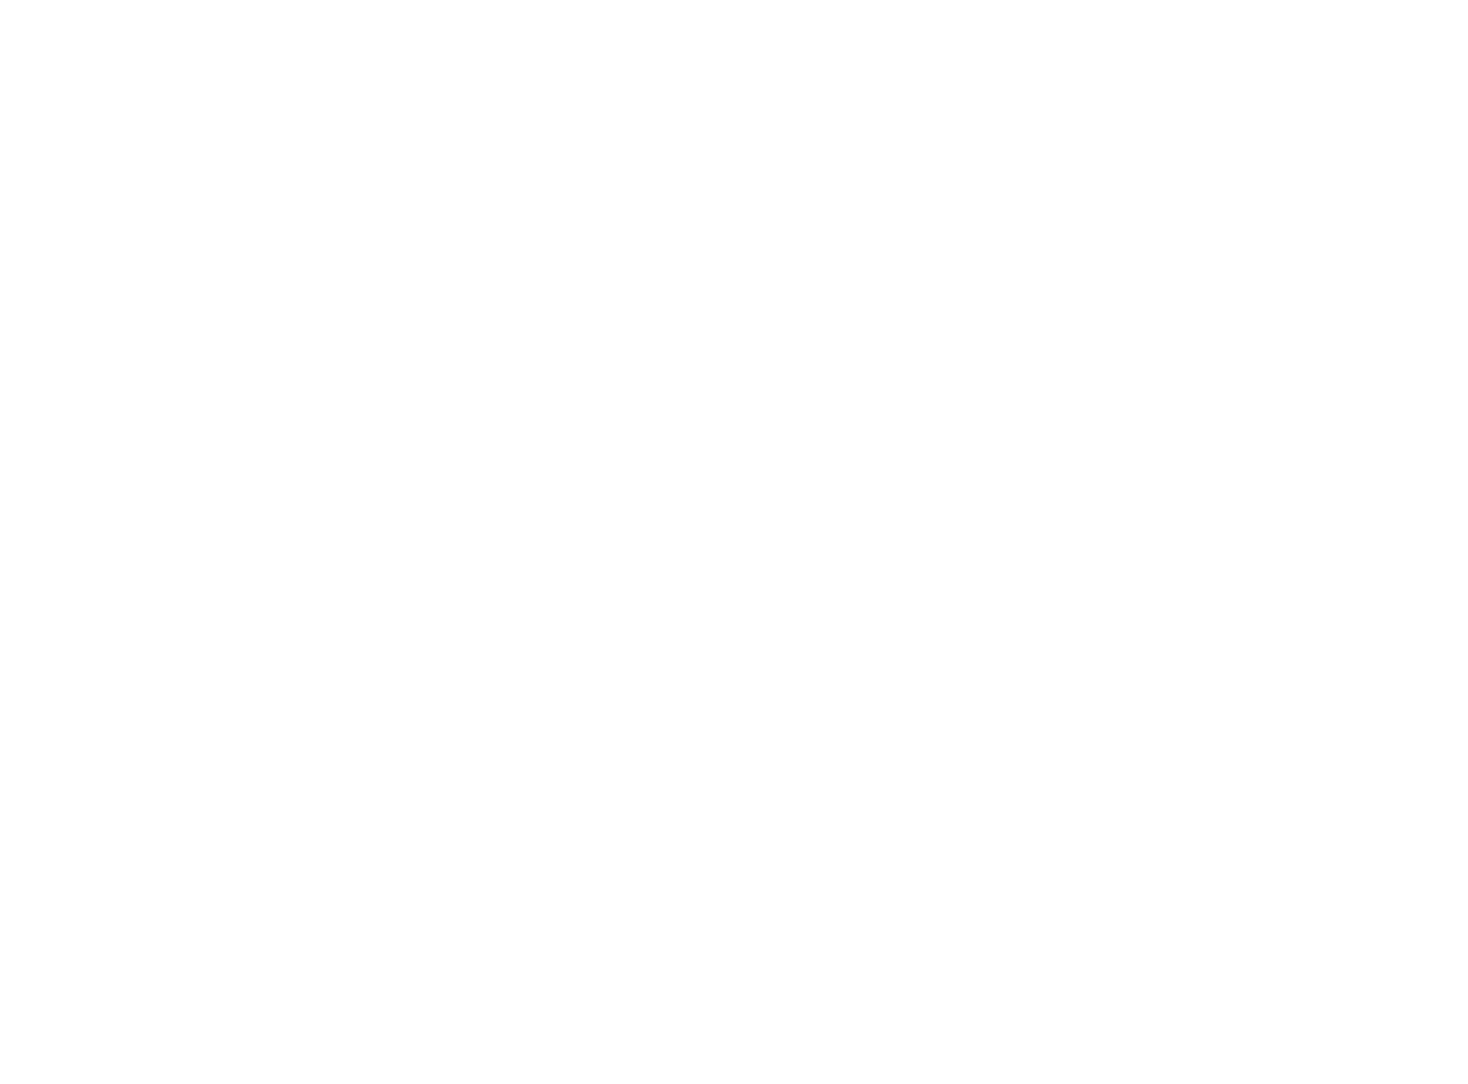 CoreValues-white.png